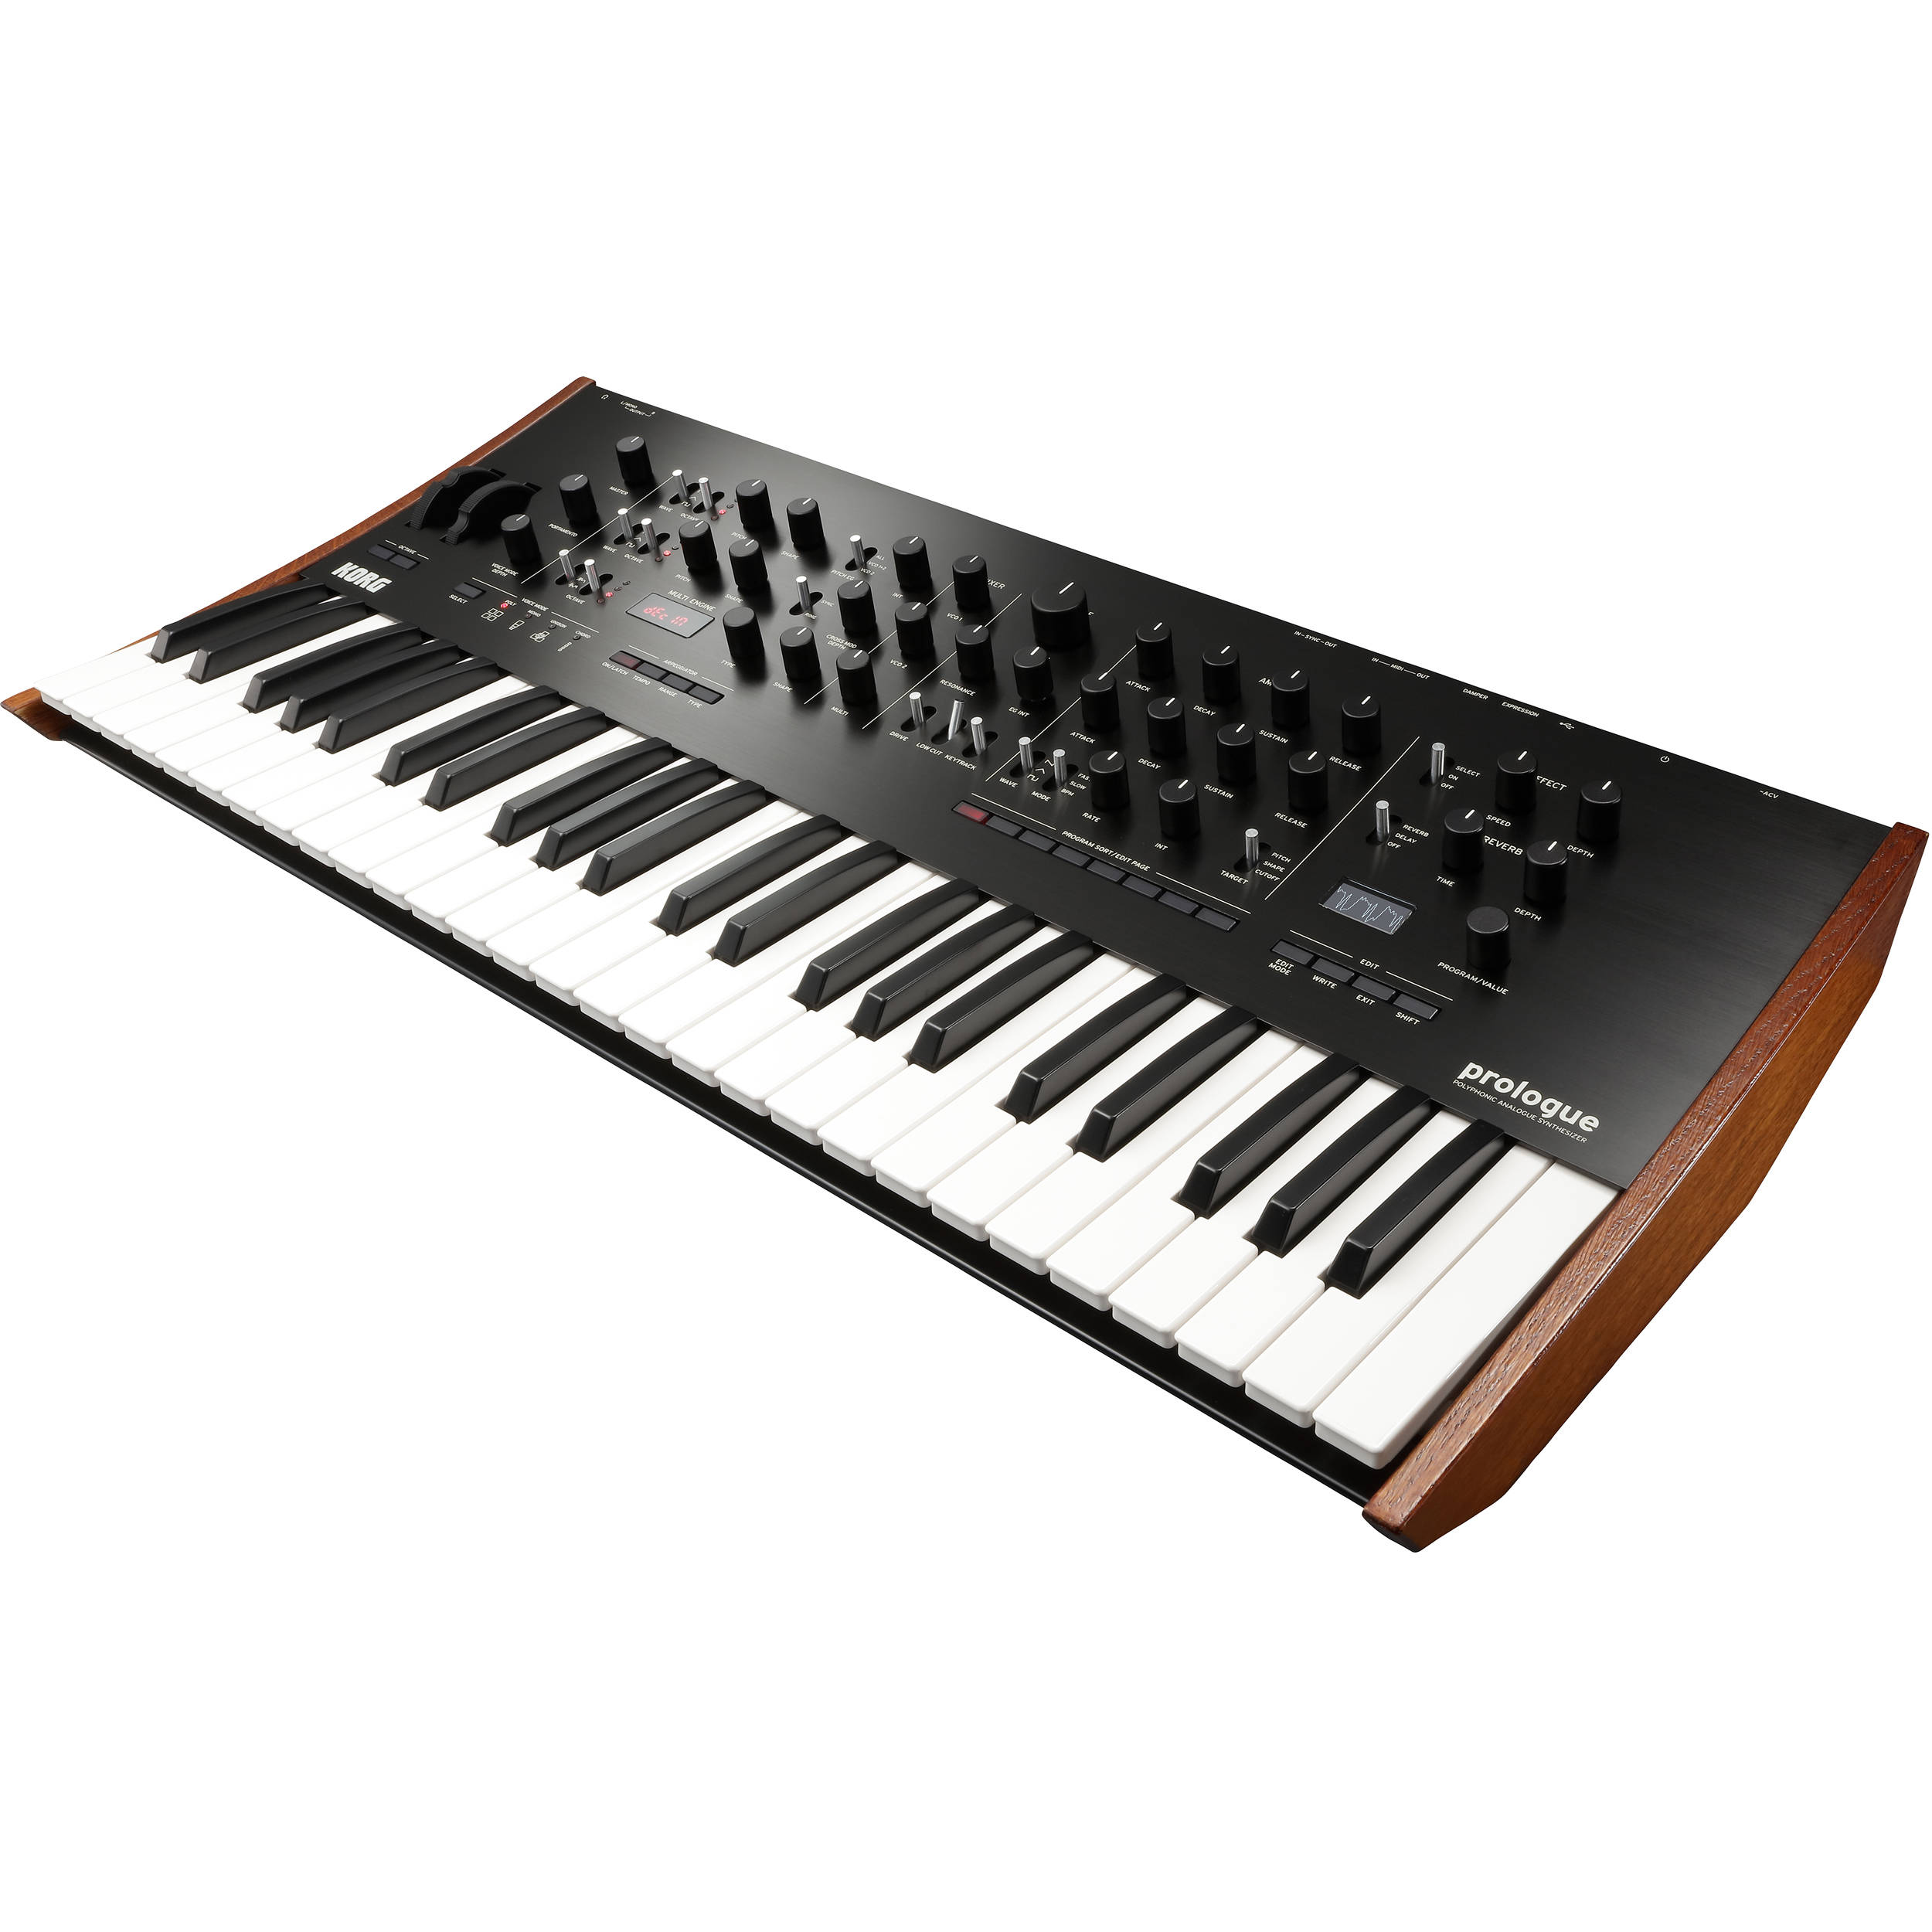 Prologue - Polyphonic Analog Synthesizer (8-Voice)